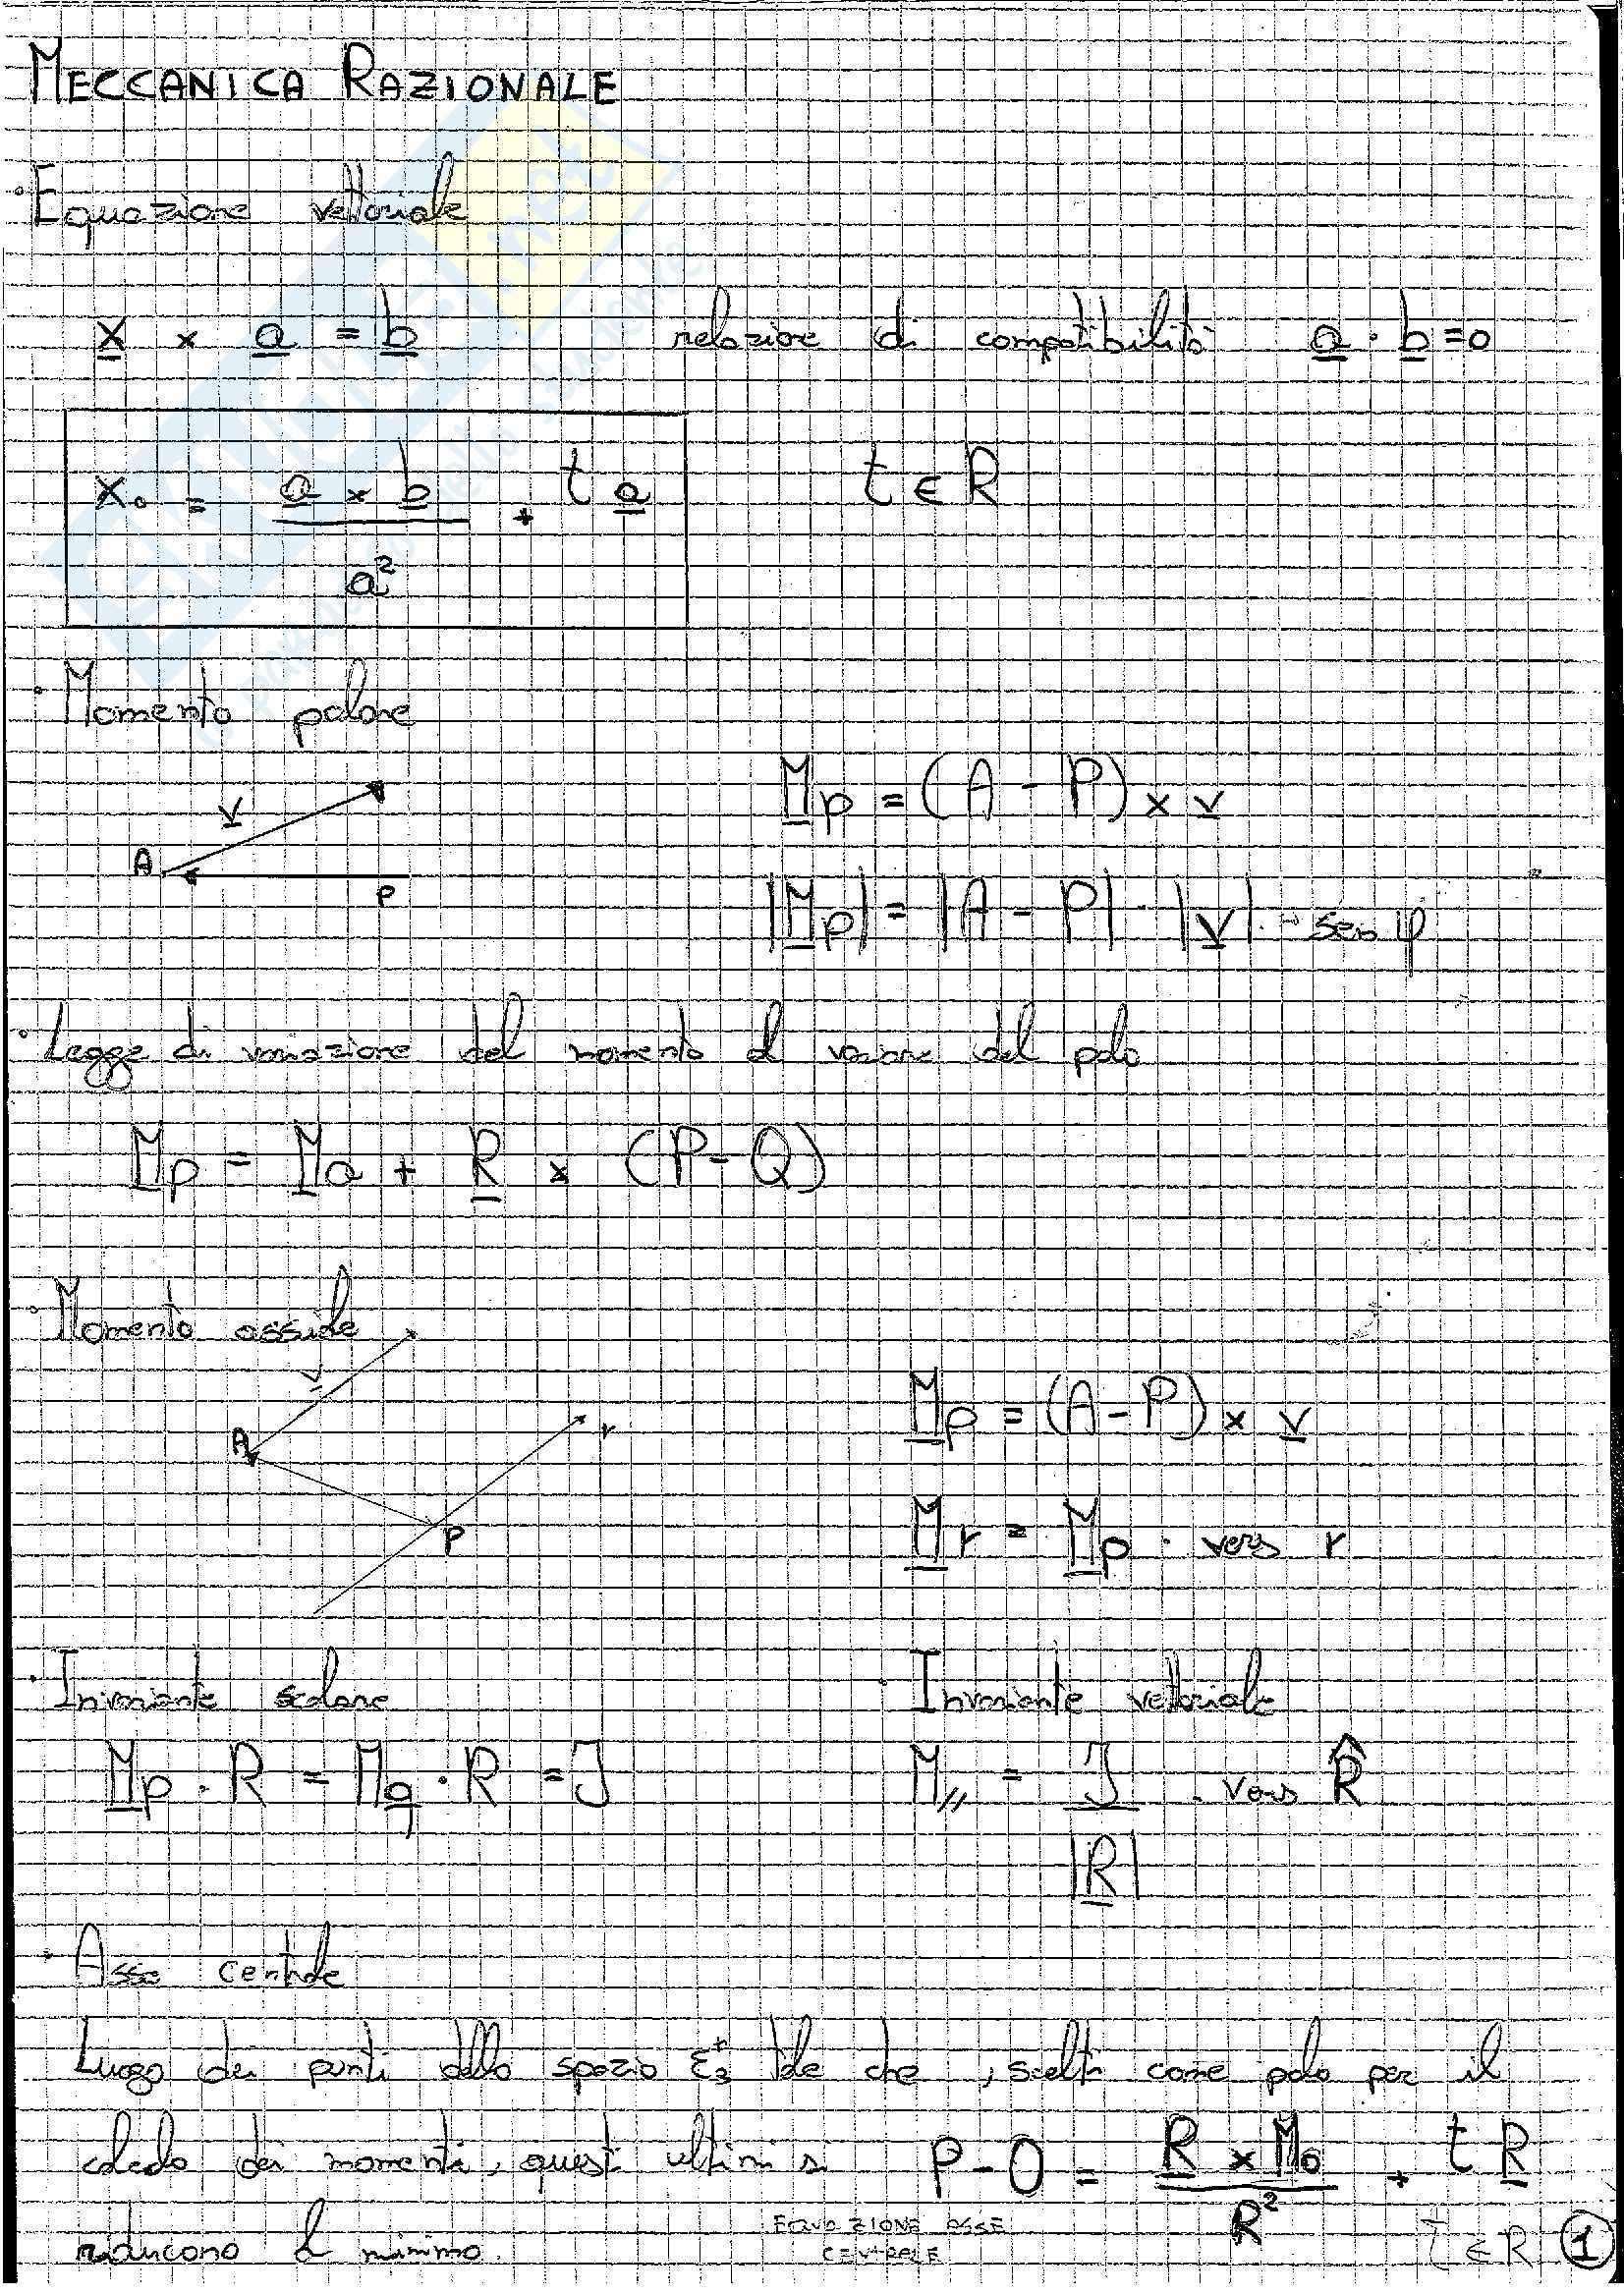 Formulario, Meccanica razionale